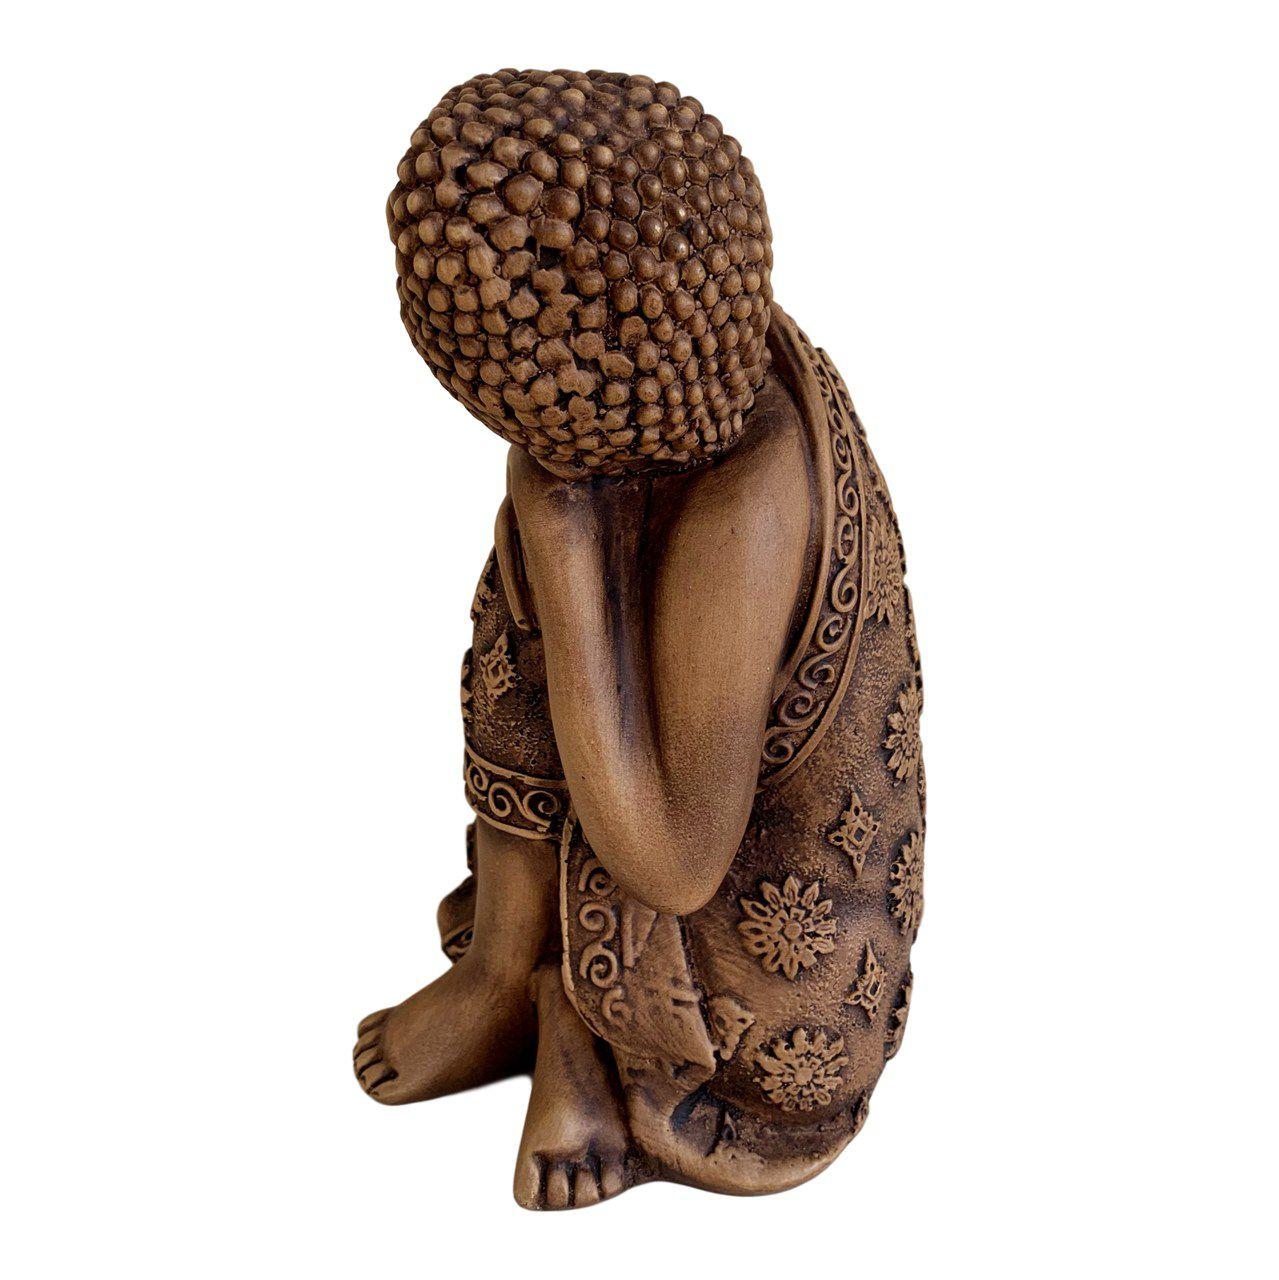 Buda de Lado - Gesso